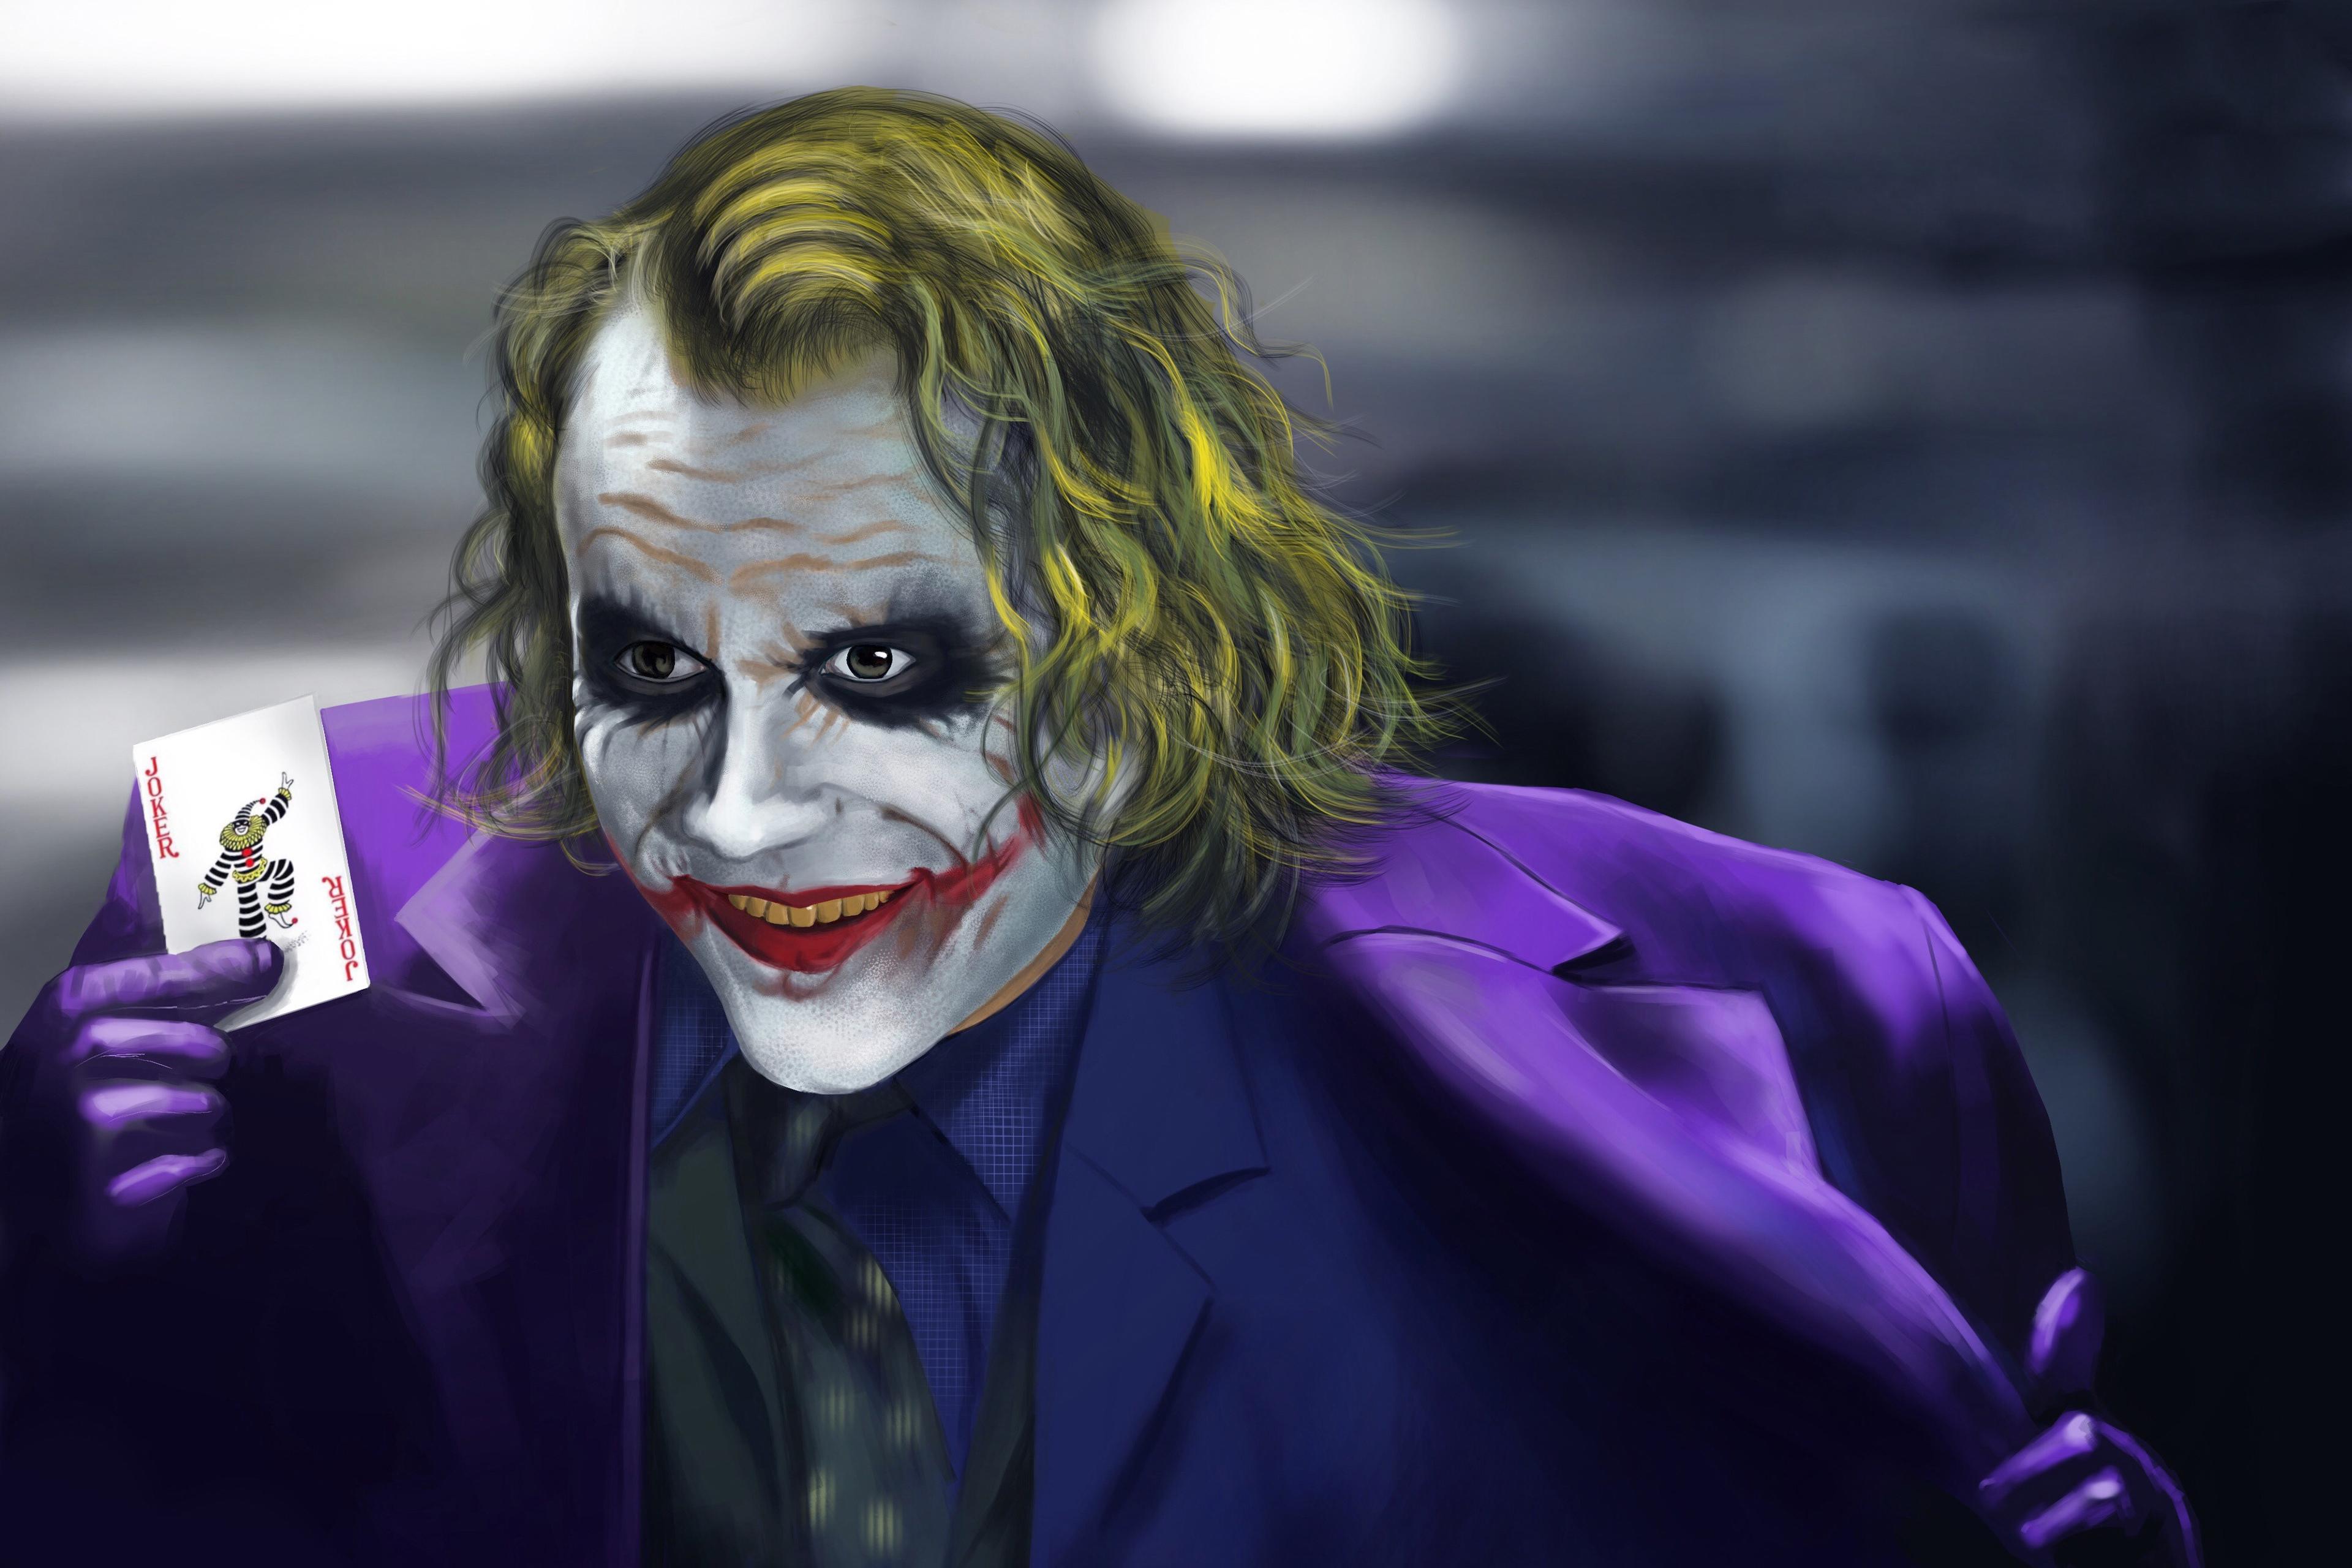 Joker 4k New Artwork, HD Superheroes, 4k Wallpapers ...